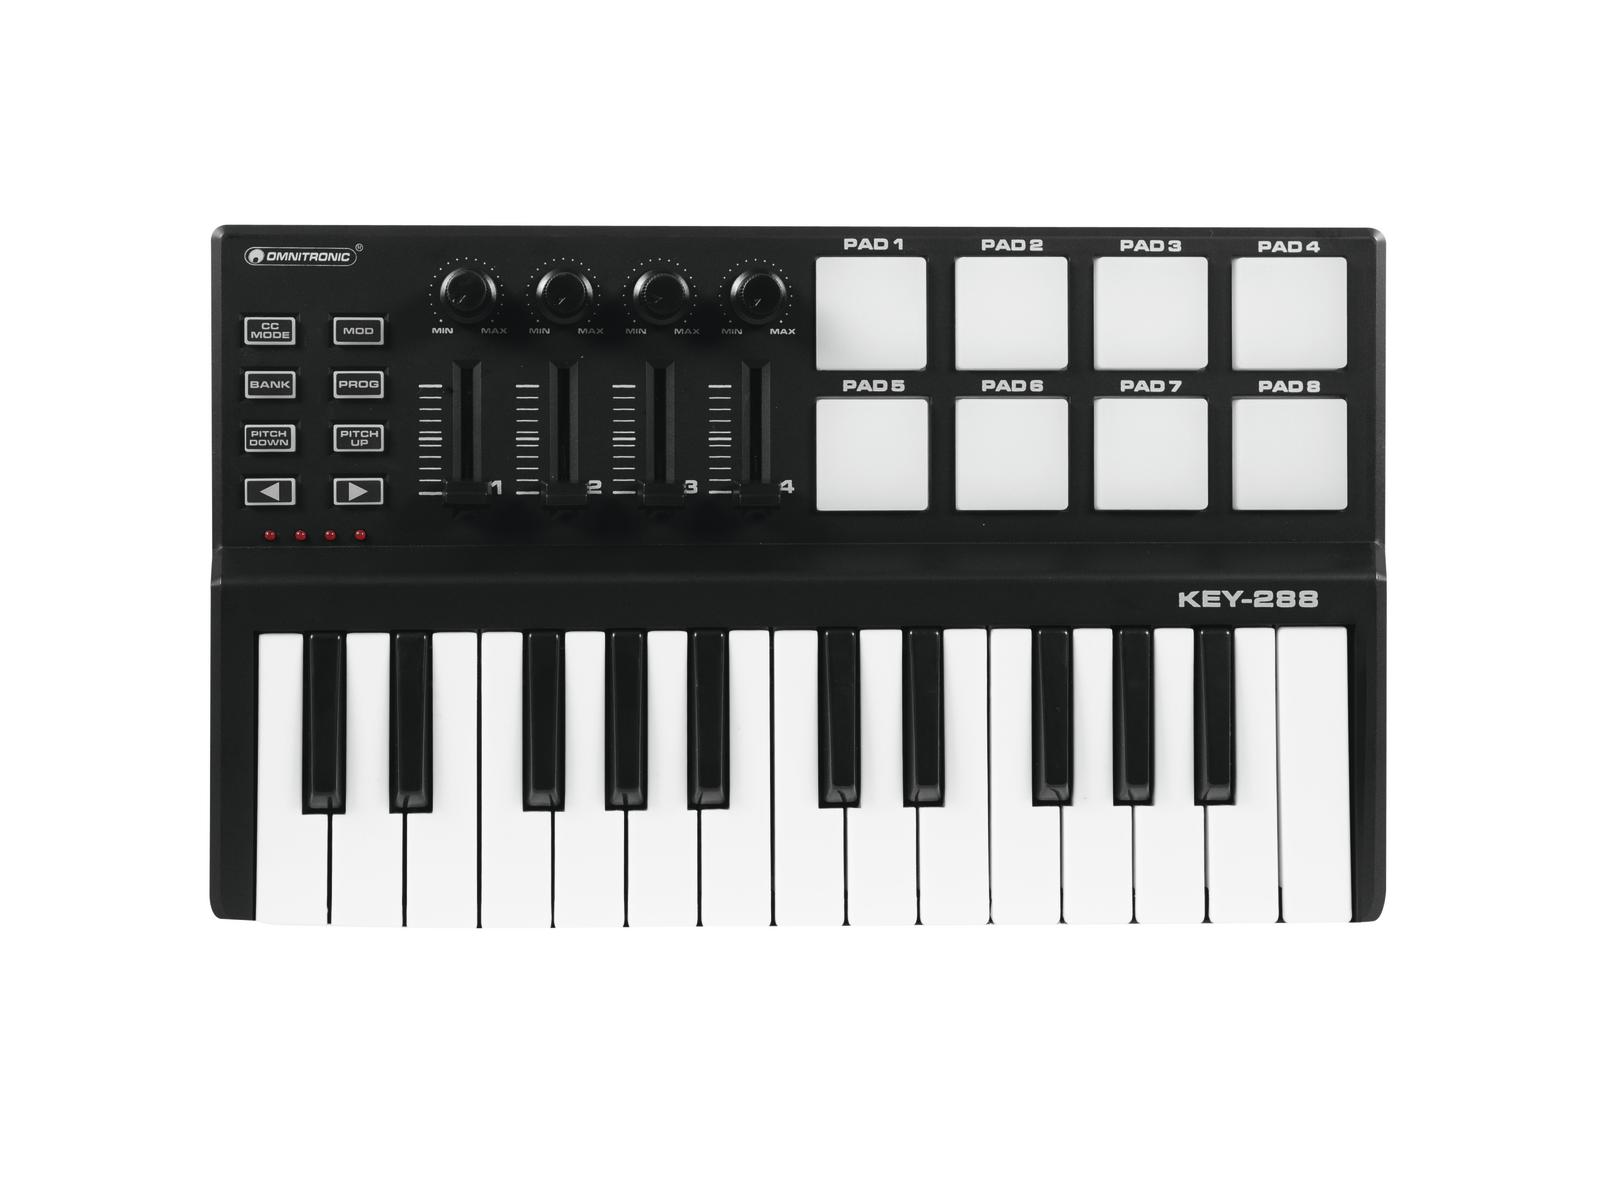 USB MIDI Controller for producing music for dj-pc mac OMNITRONIC key-288